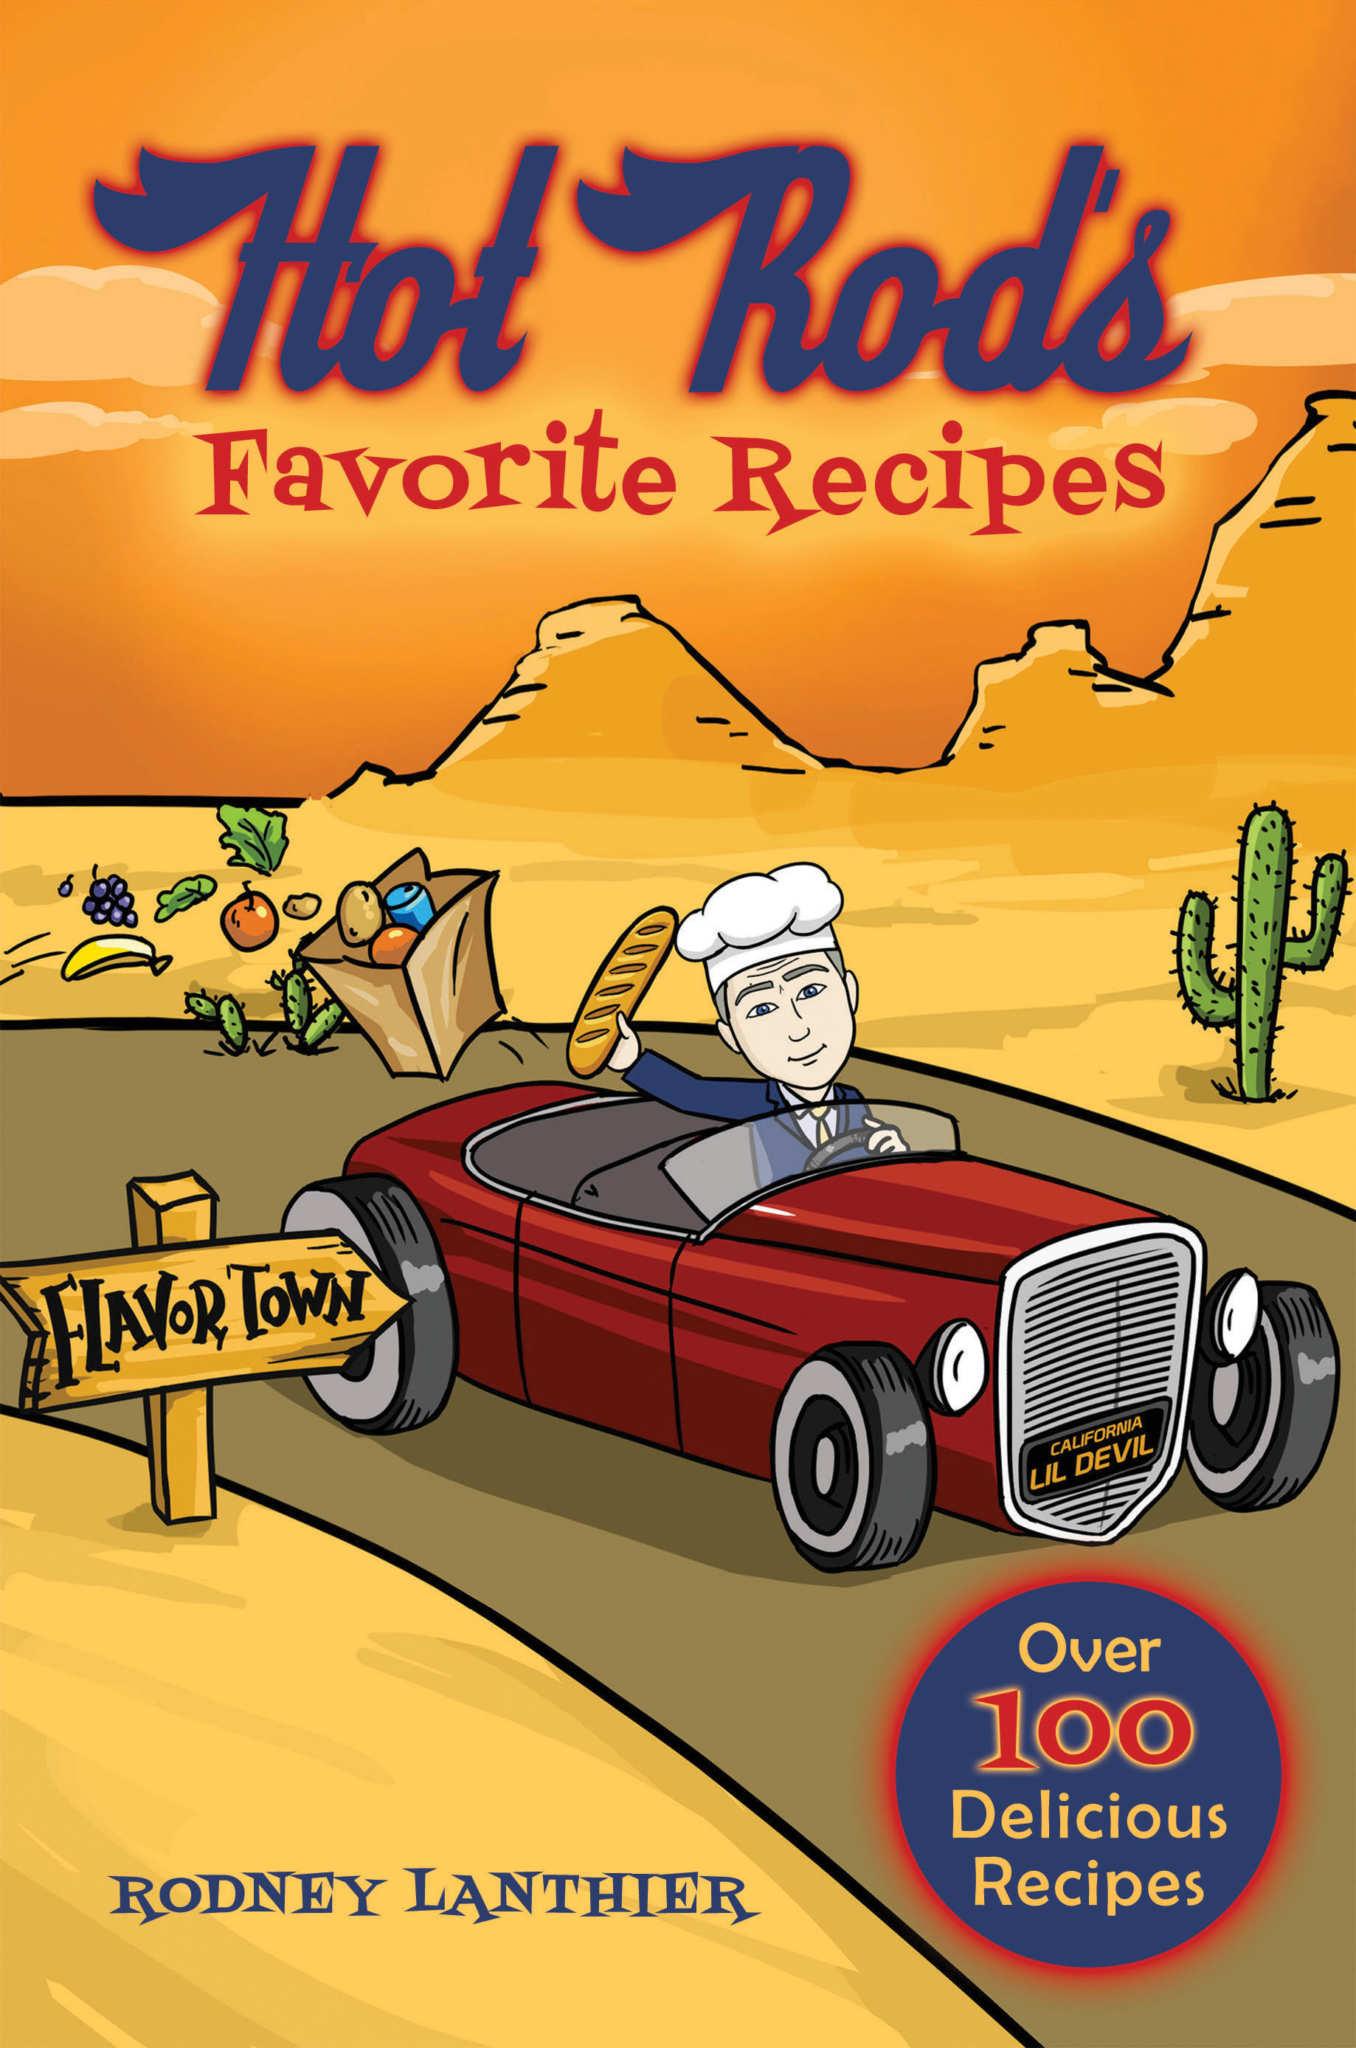 Hot Rod's Favorite Recipes